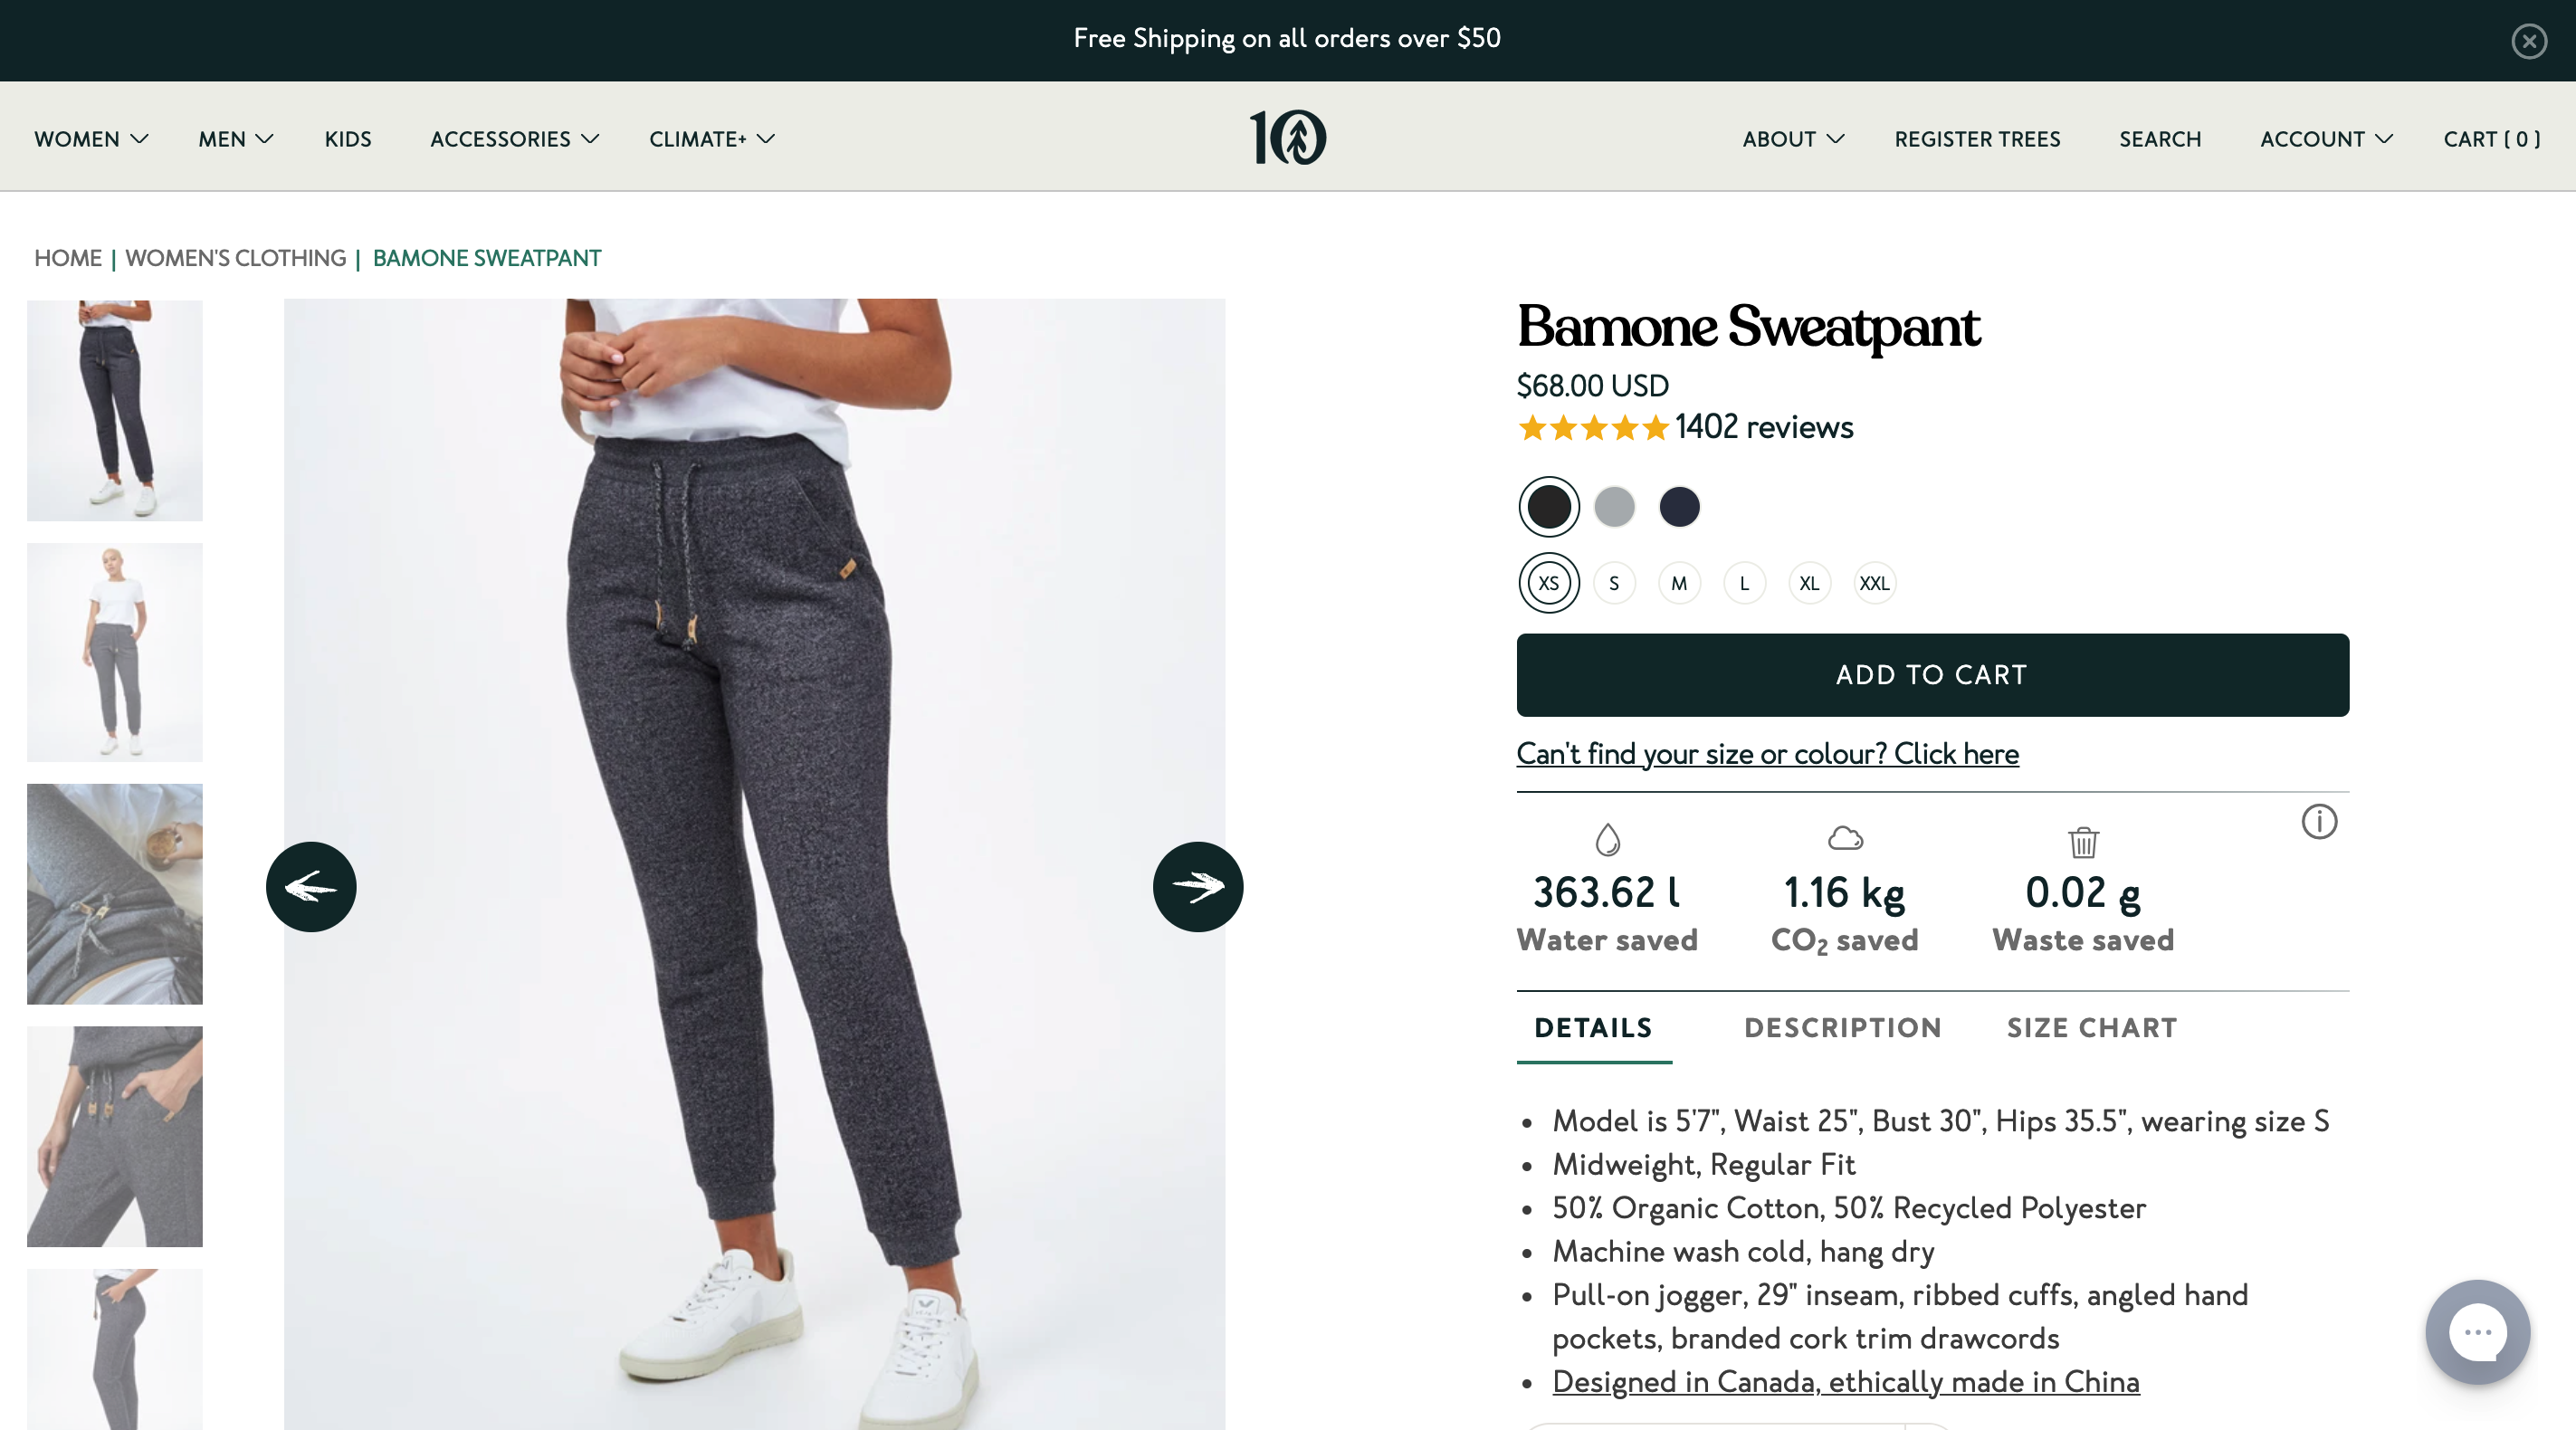 product details ecommerce